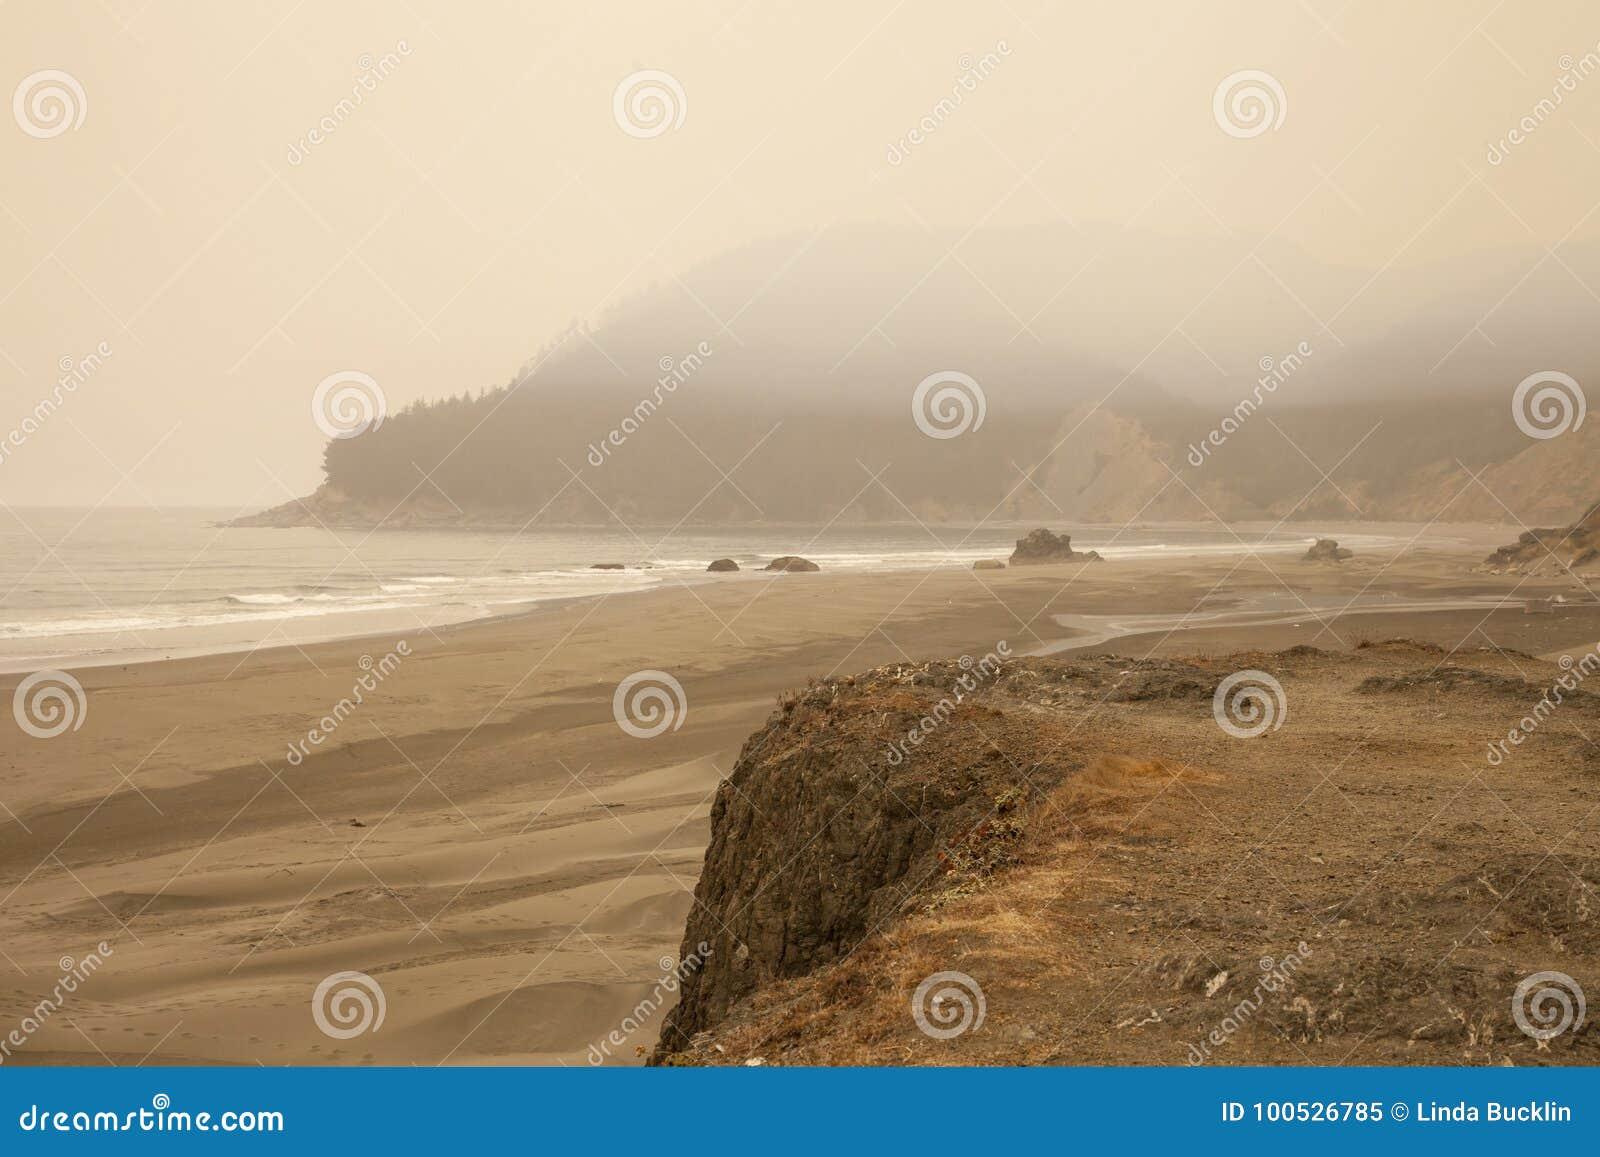 Smokey Beach From Oregon Wildfires